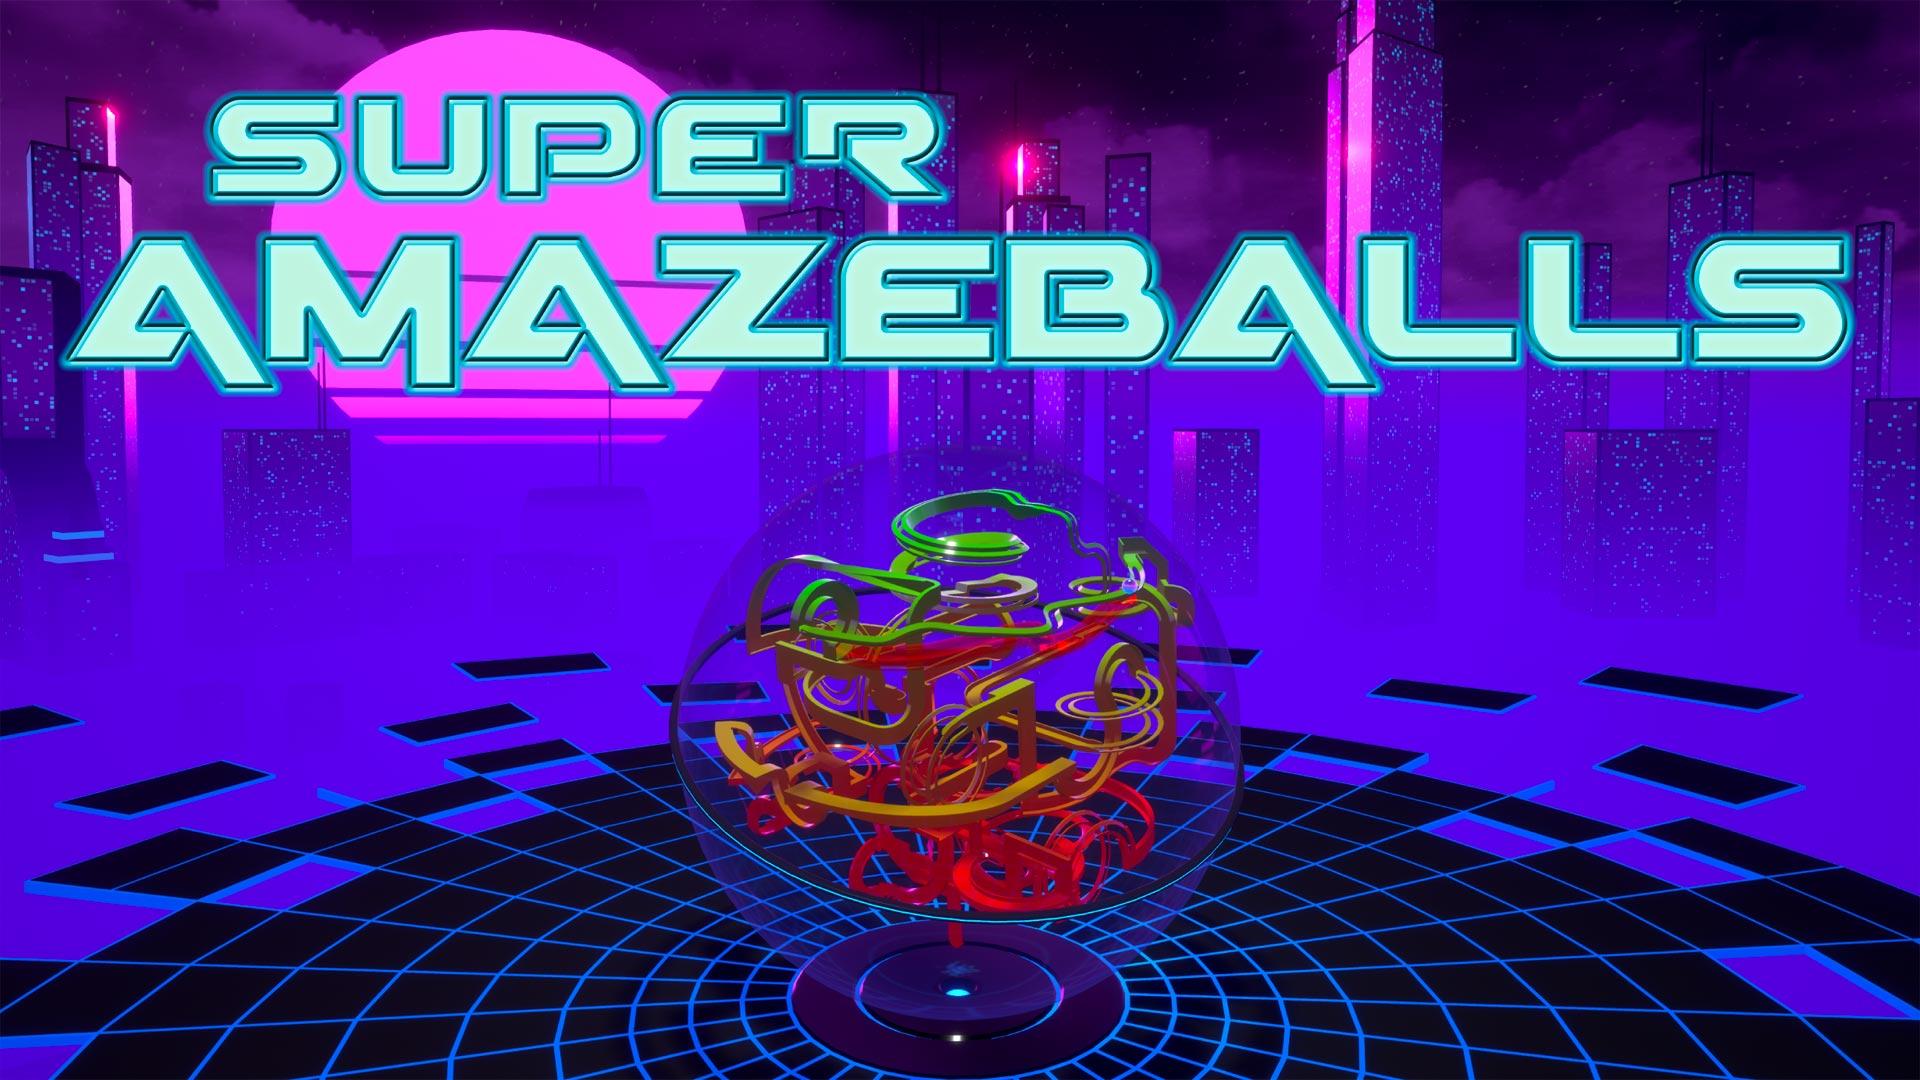 Super Amazeballs PSVR